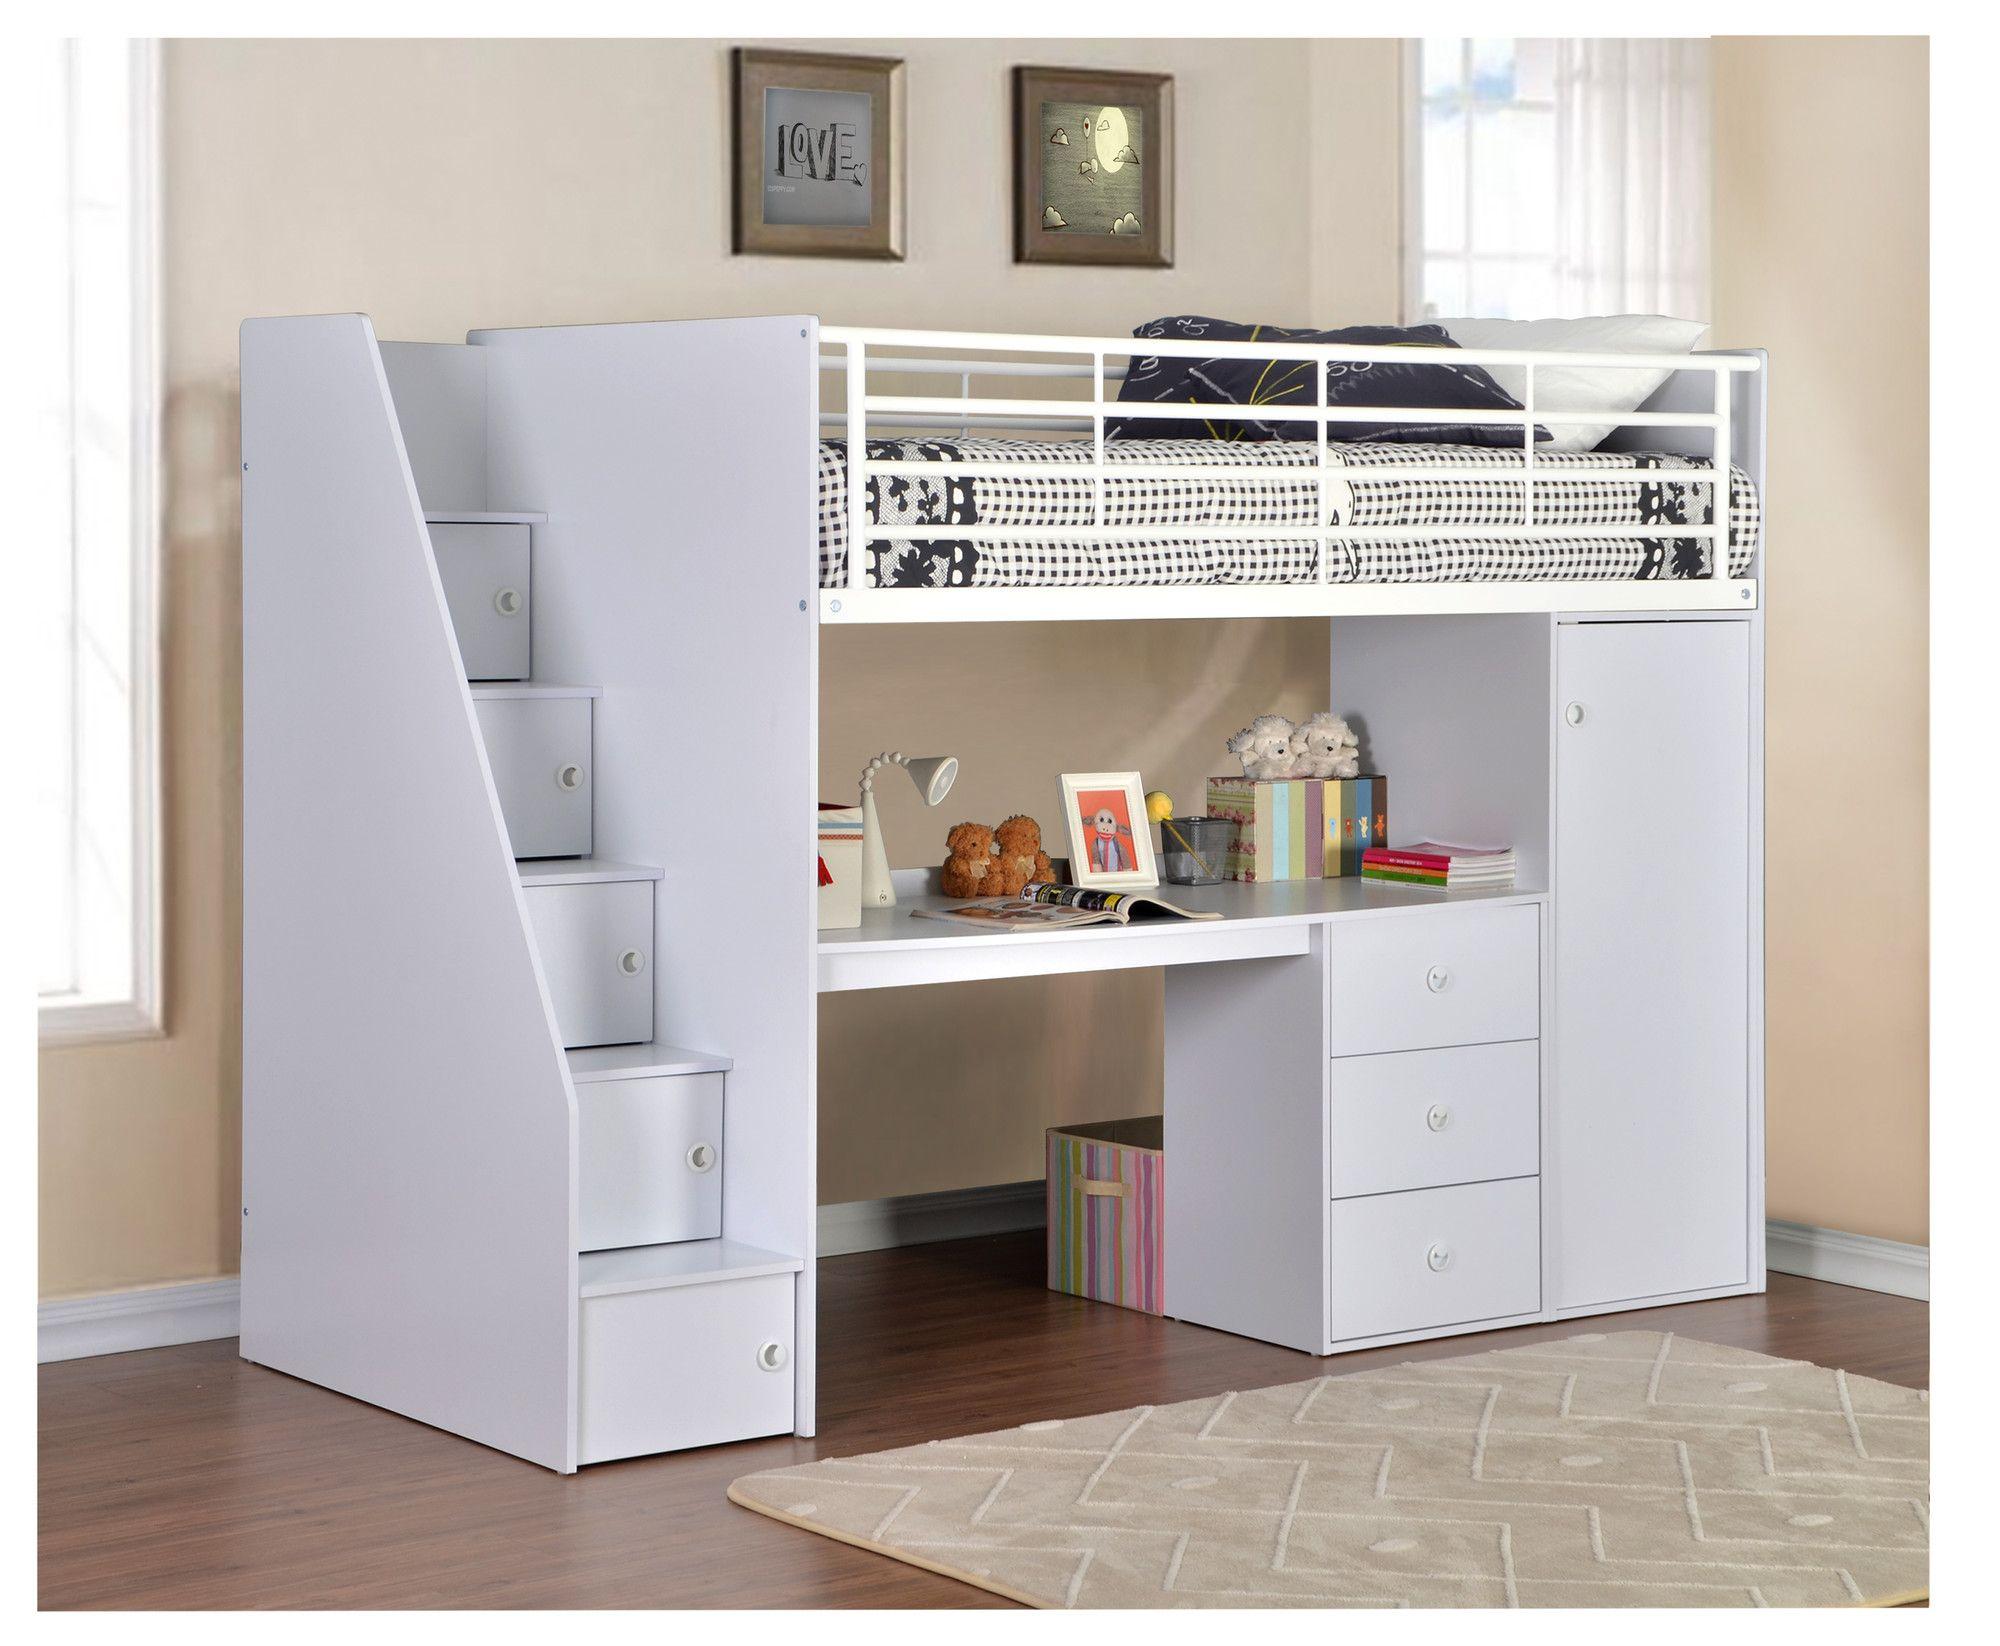 High sleeper loft style cabin bed with hideaway futon bed rutland - Flintshire Furniture Dakota Single High Sleeper Bed With Workstation Reviews Wayfair Co